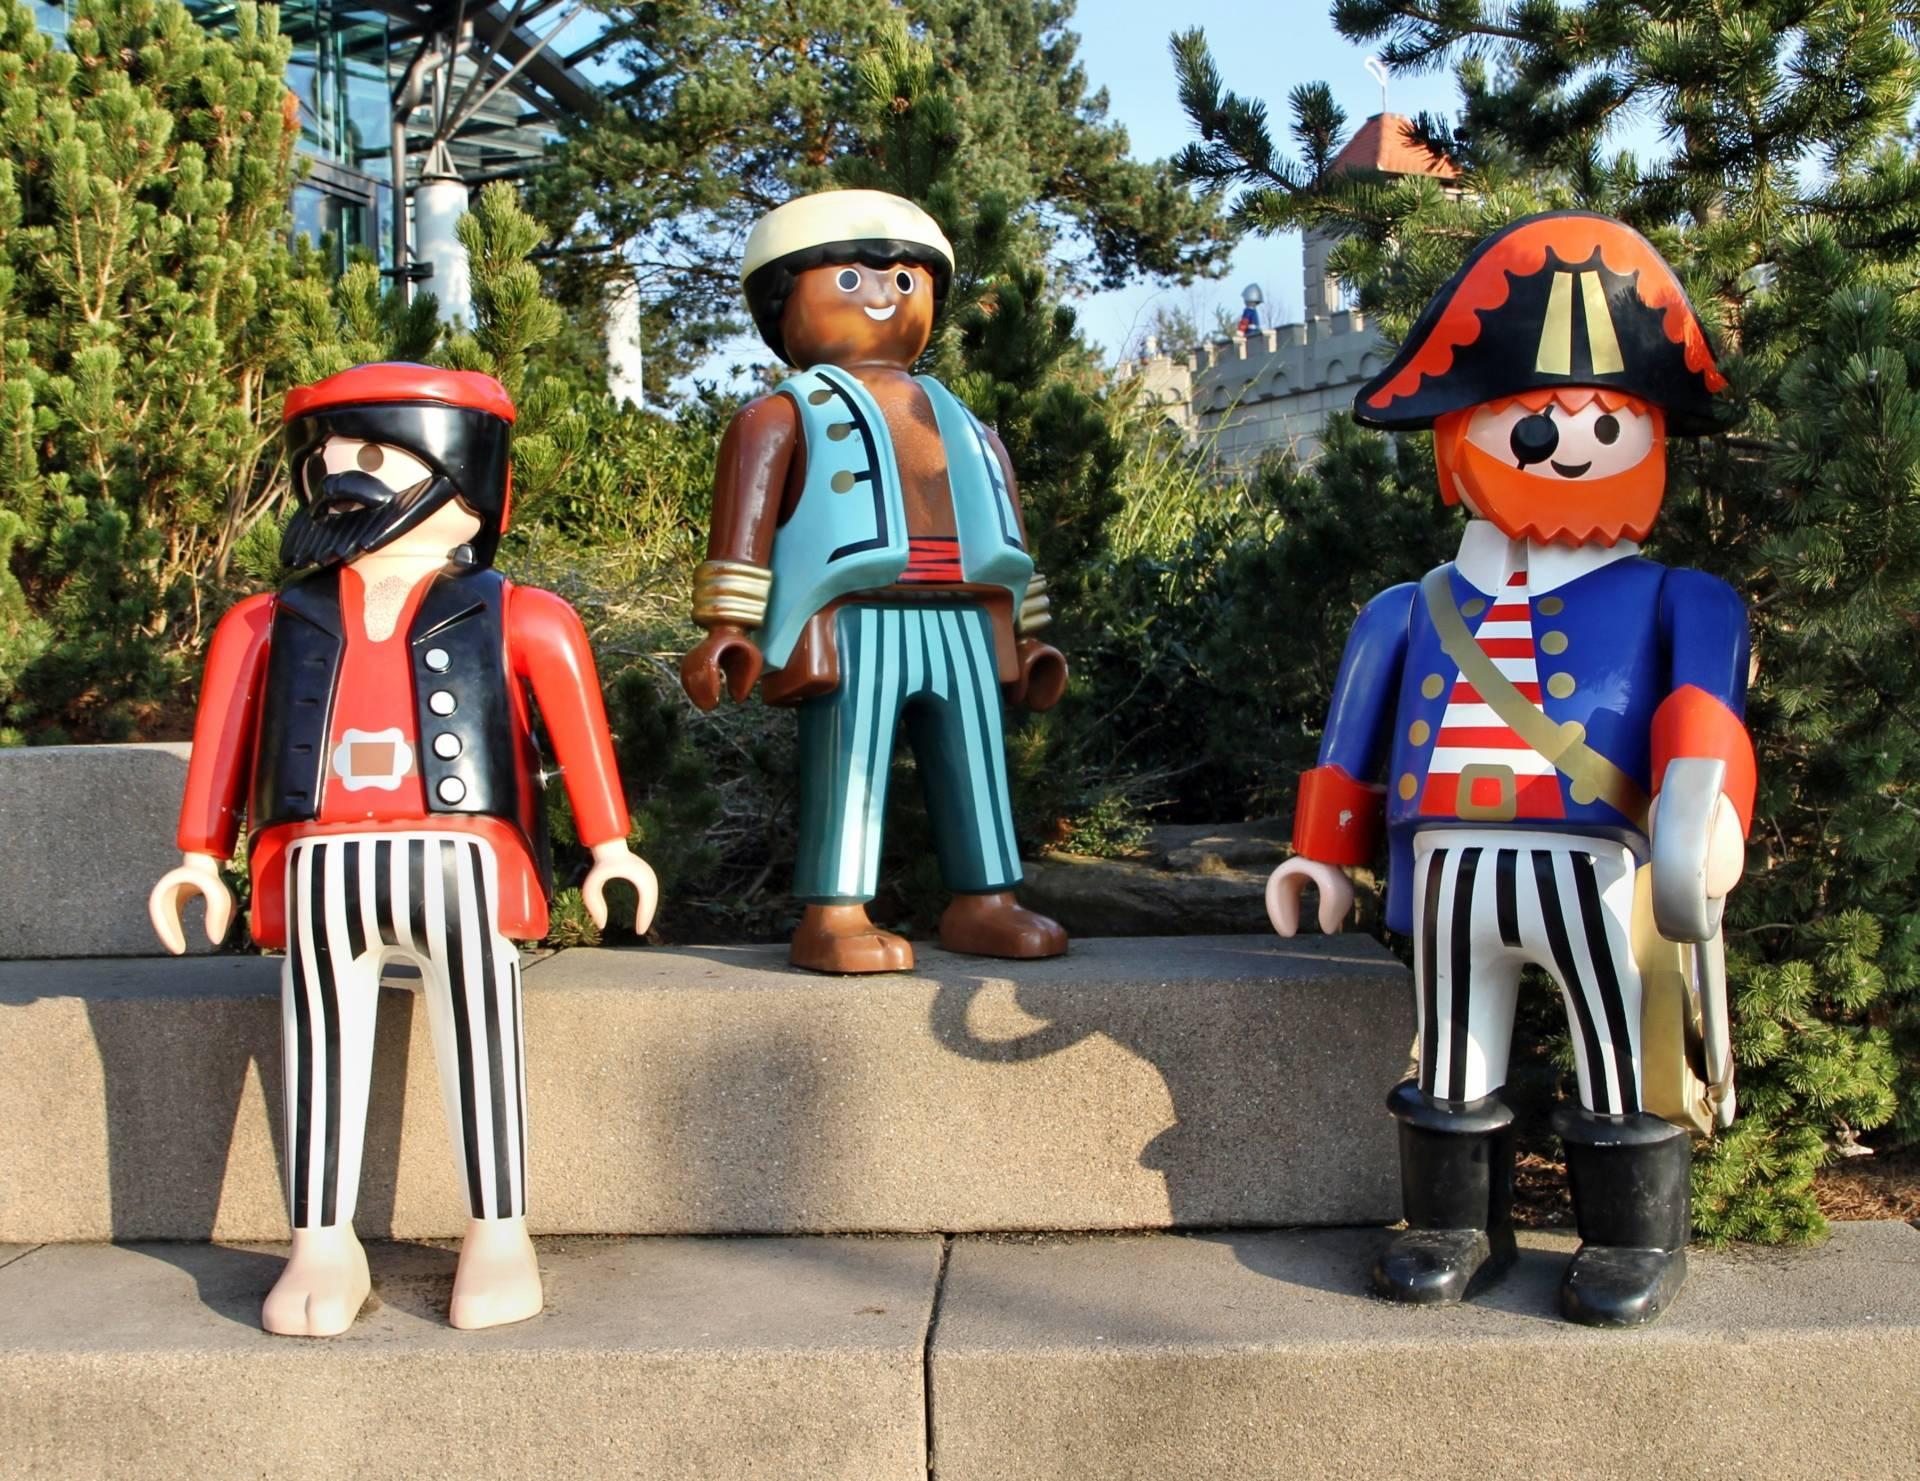 Playmobil Funpark Eintrittspreise 2016: Piraten-Figuren im Playmobil-Funpark